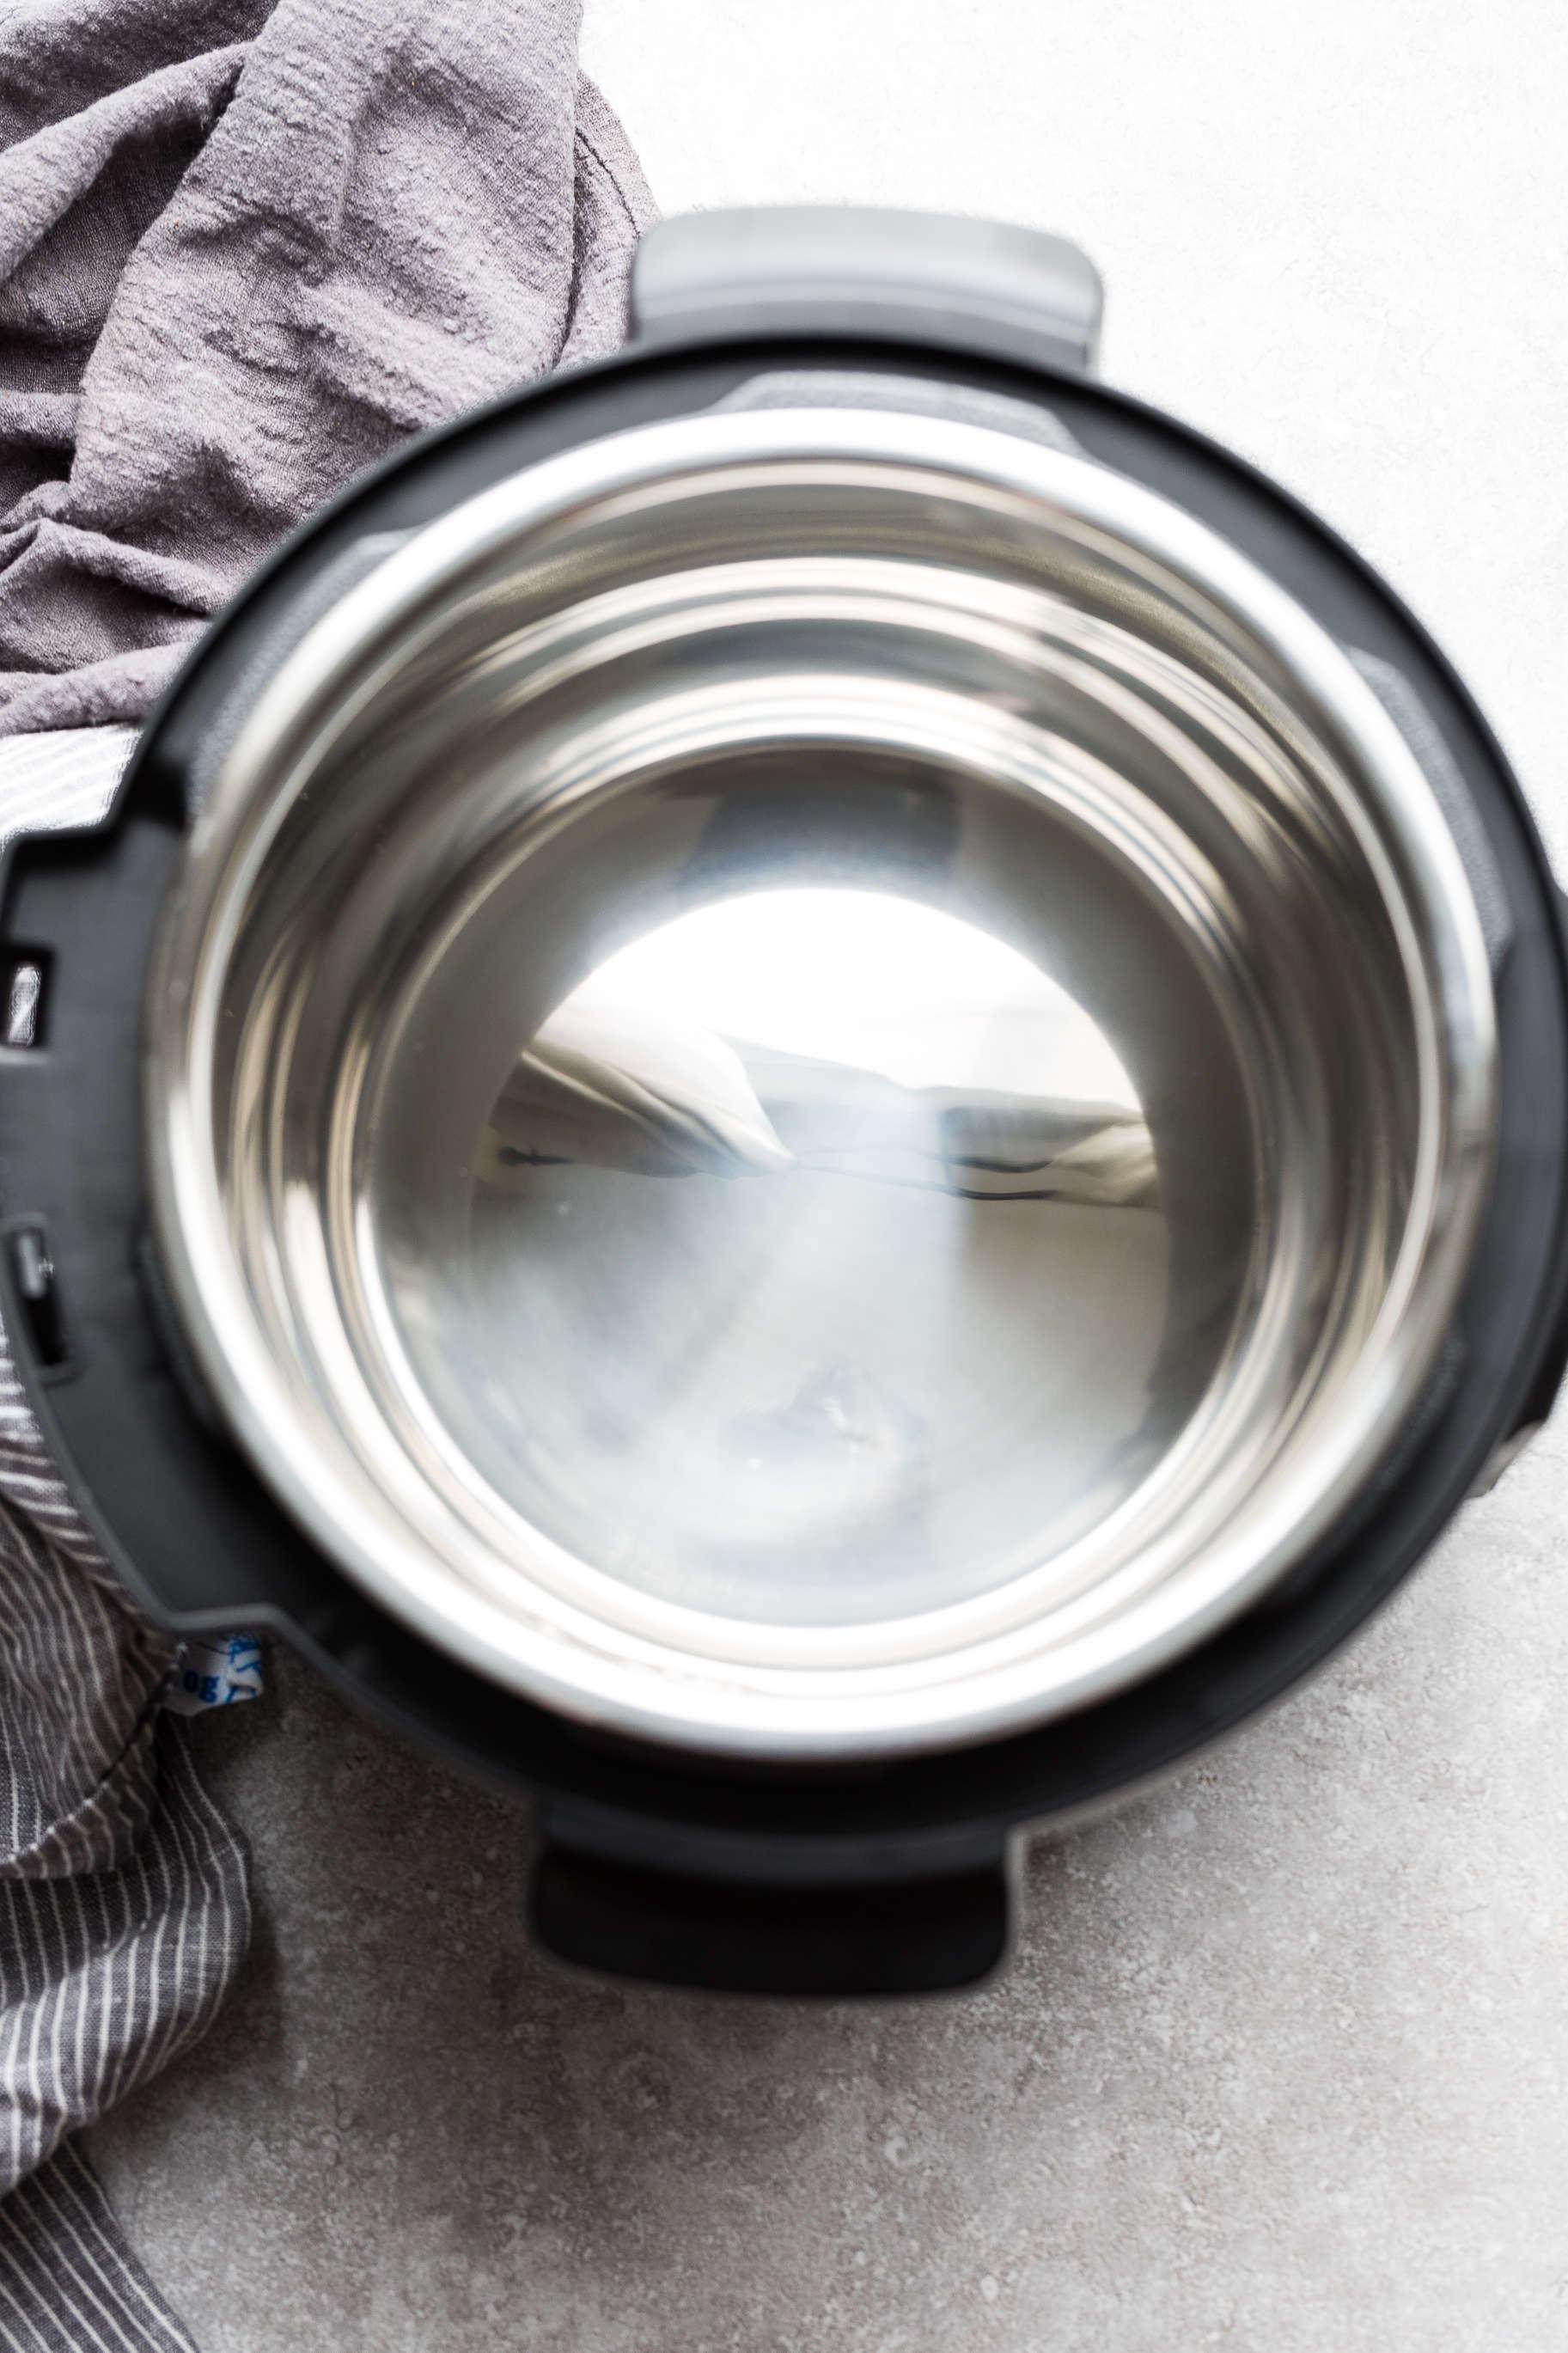 Overhead view of an empty Power Quick Pot